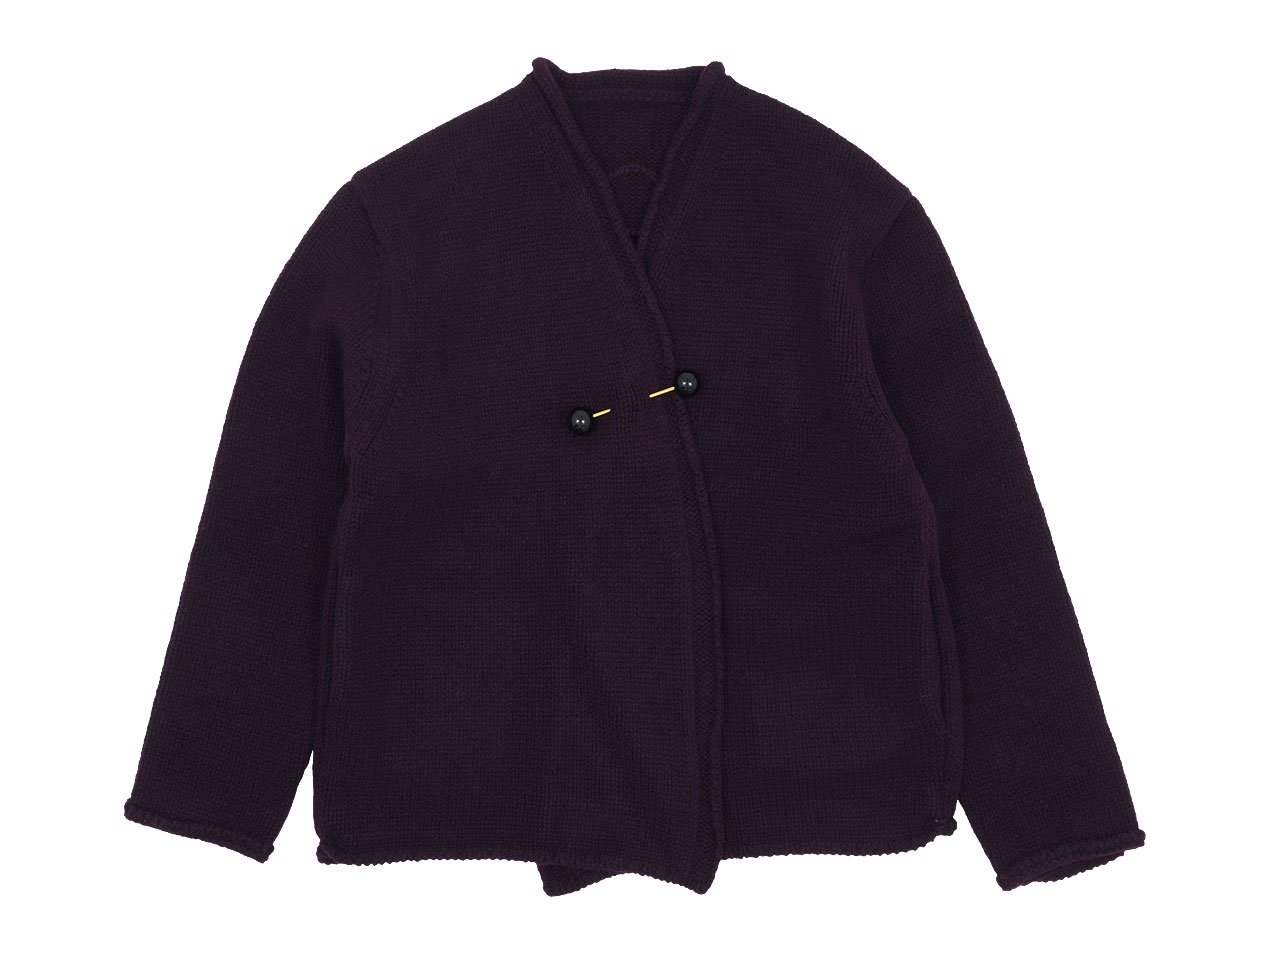 Atelier d'antan Degas(ドガ) Wool Knit Cardigan WINE